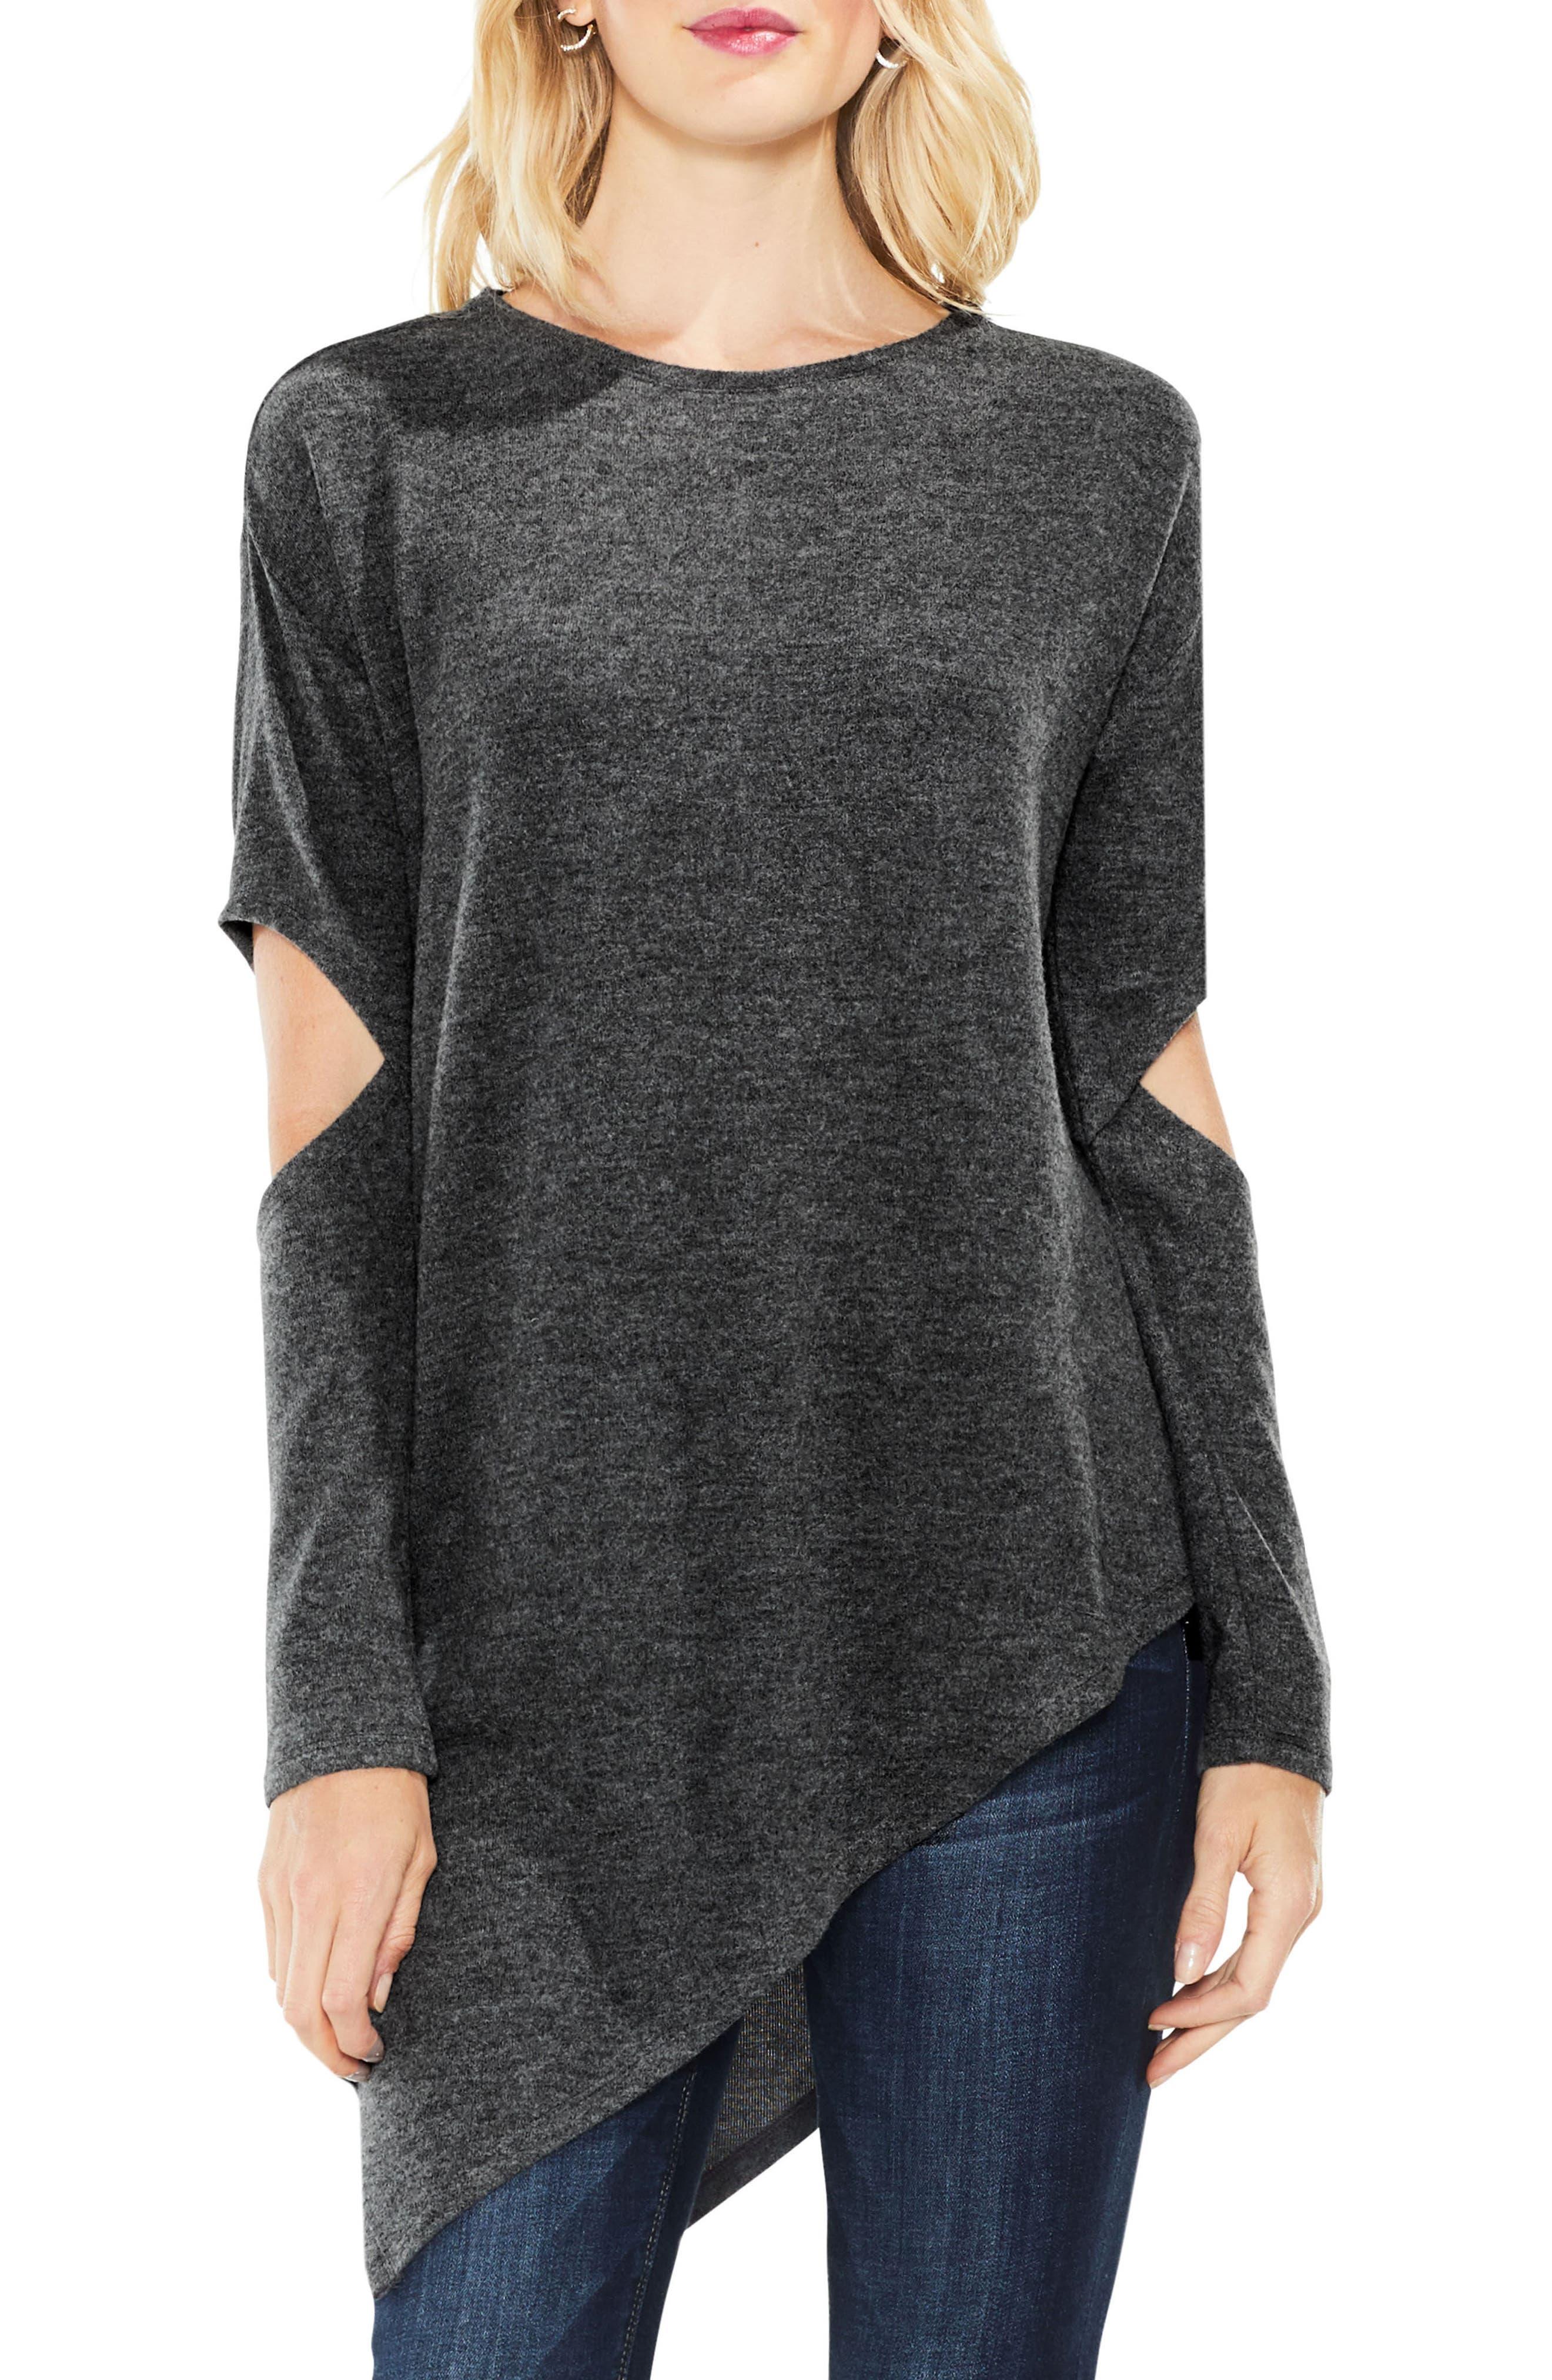 Cold Elbow Asymmetrical Top,                         Main,                         color, Med Heather Grey